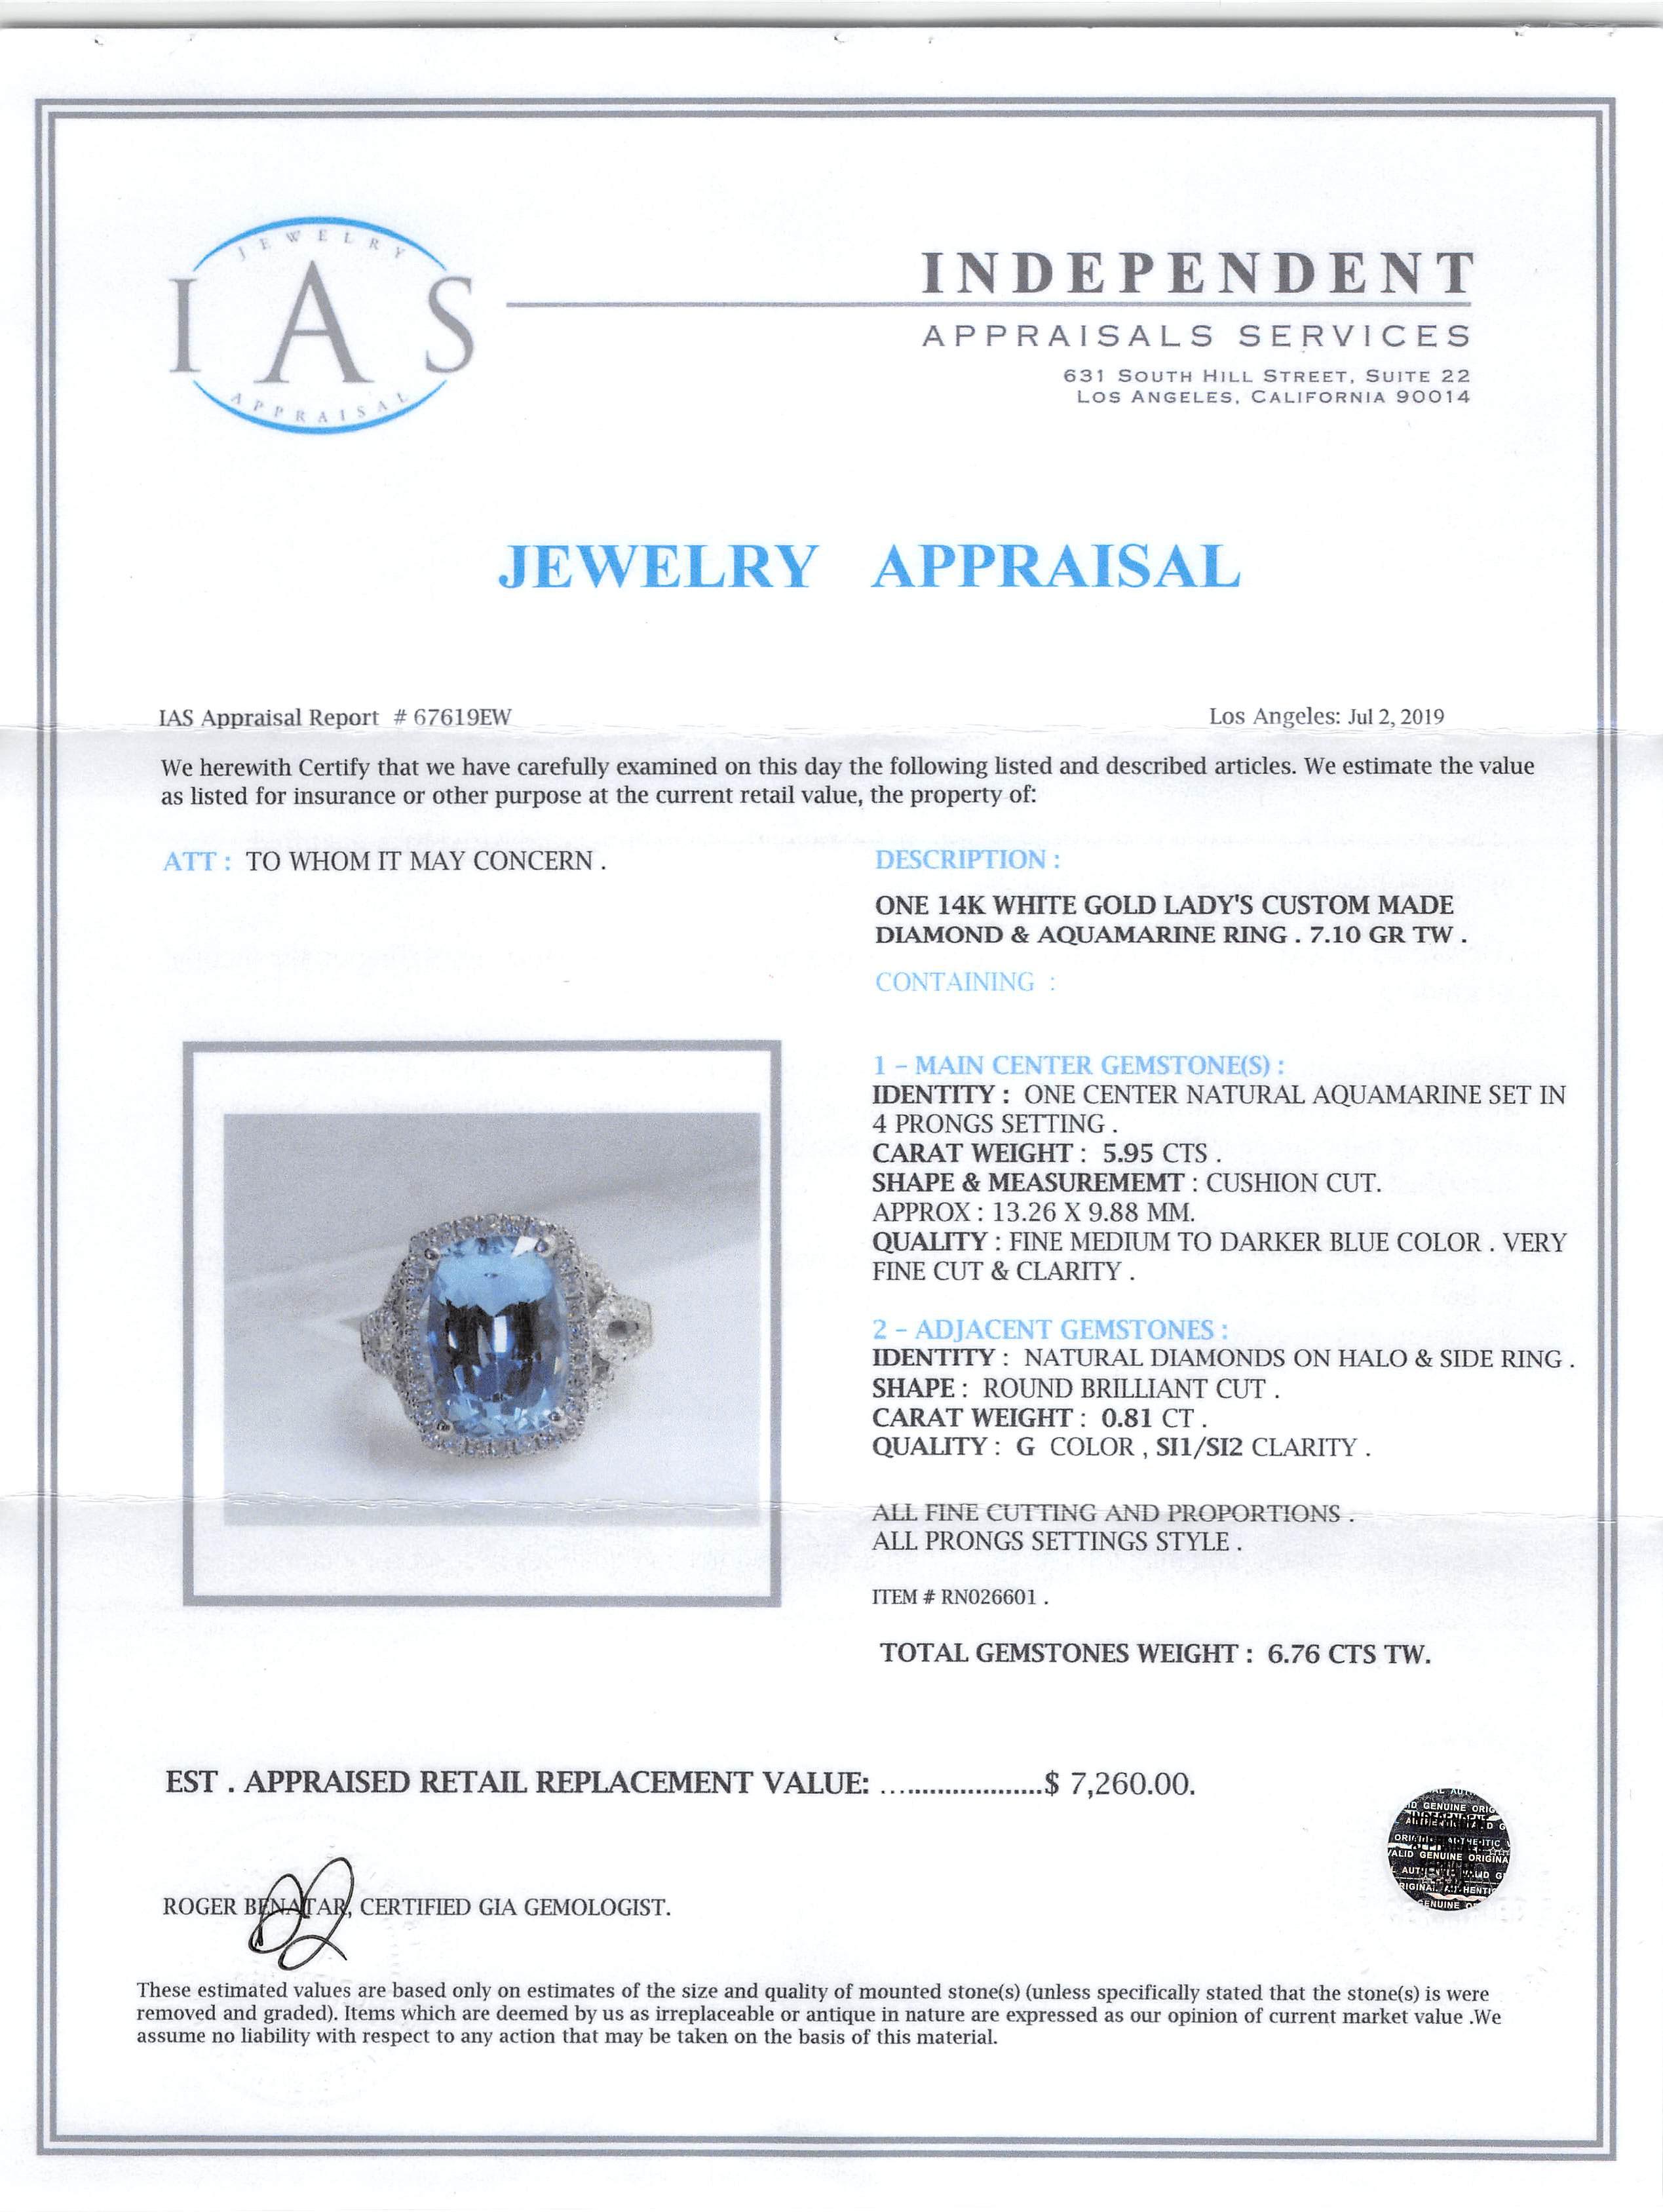 Lot 594 - 14 kt. White Gold, Aquamarine and Diamond Ring , prong set cushion cut aquamarine, approx. 5.95